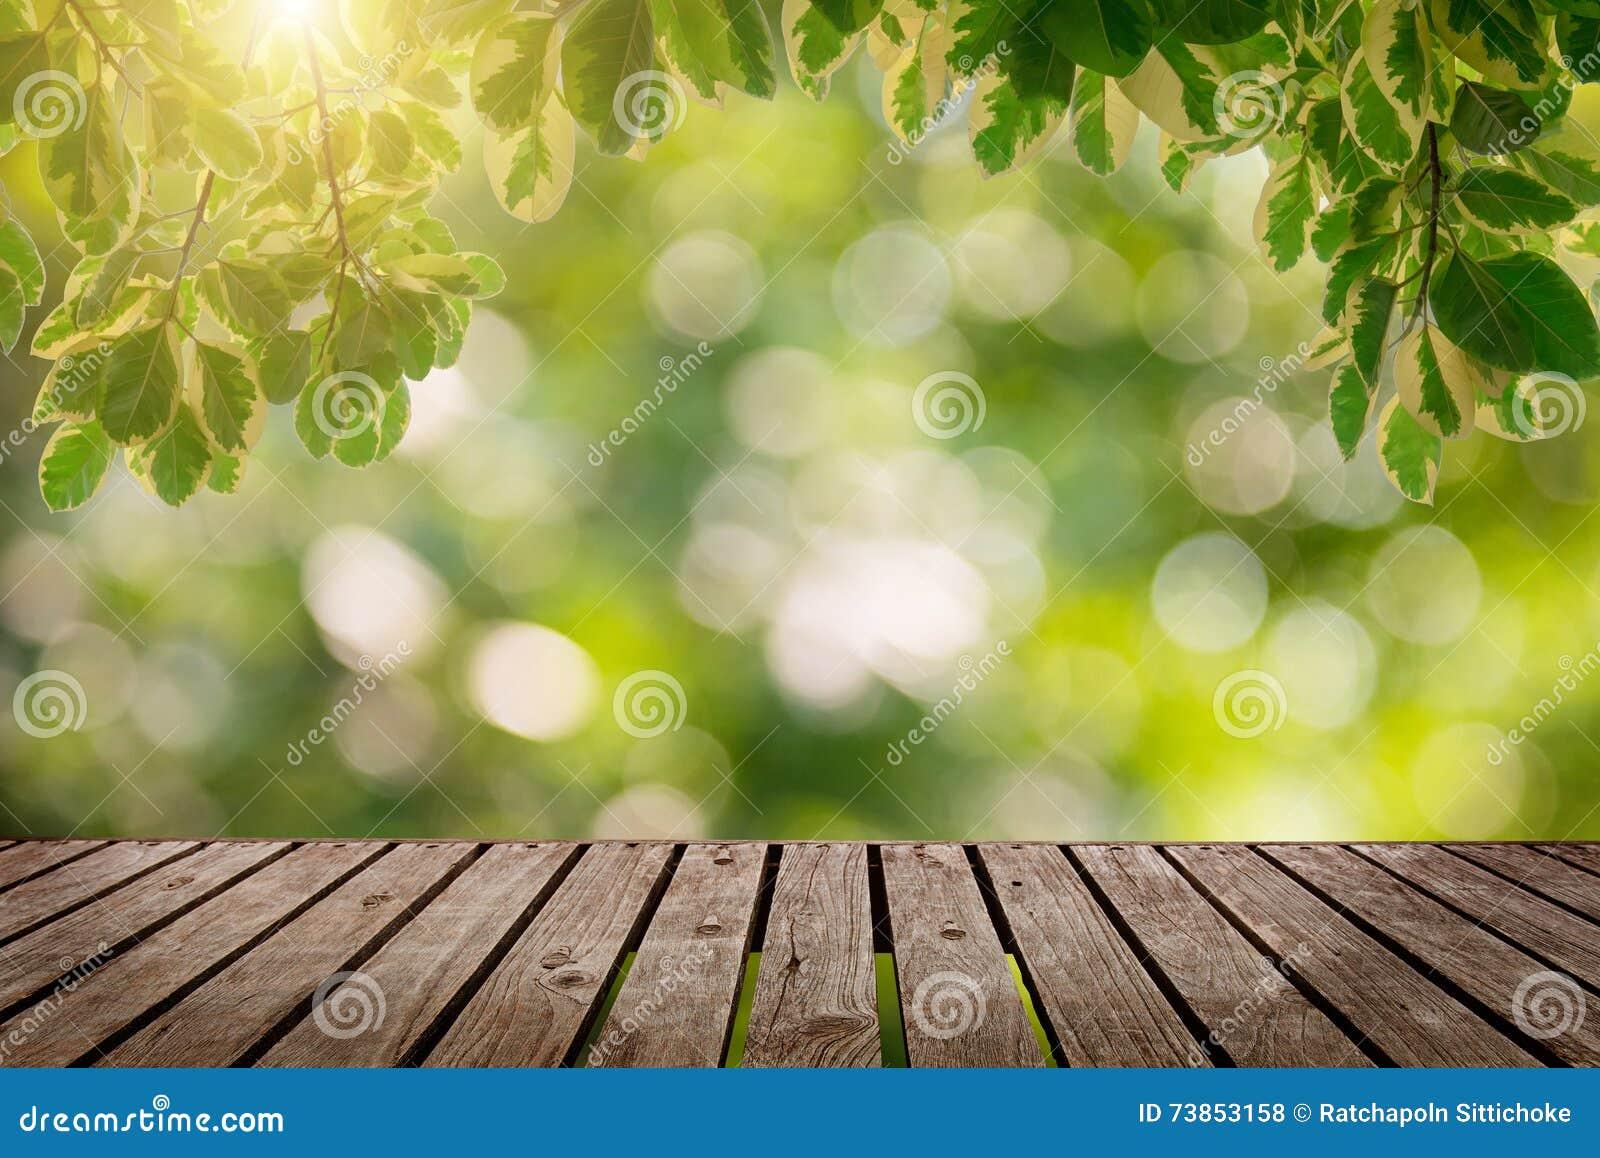 Fond simple en bois de bureau et de jardin photo stock image du